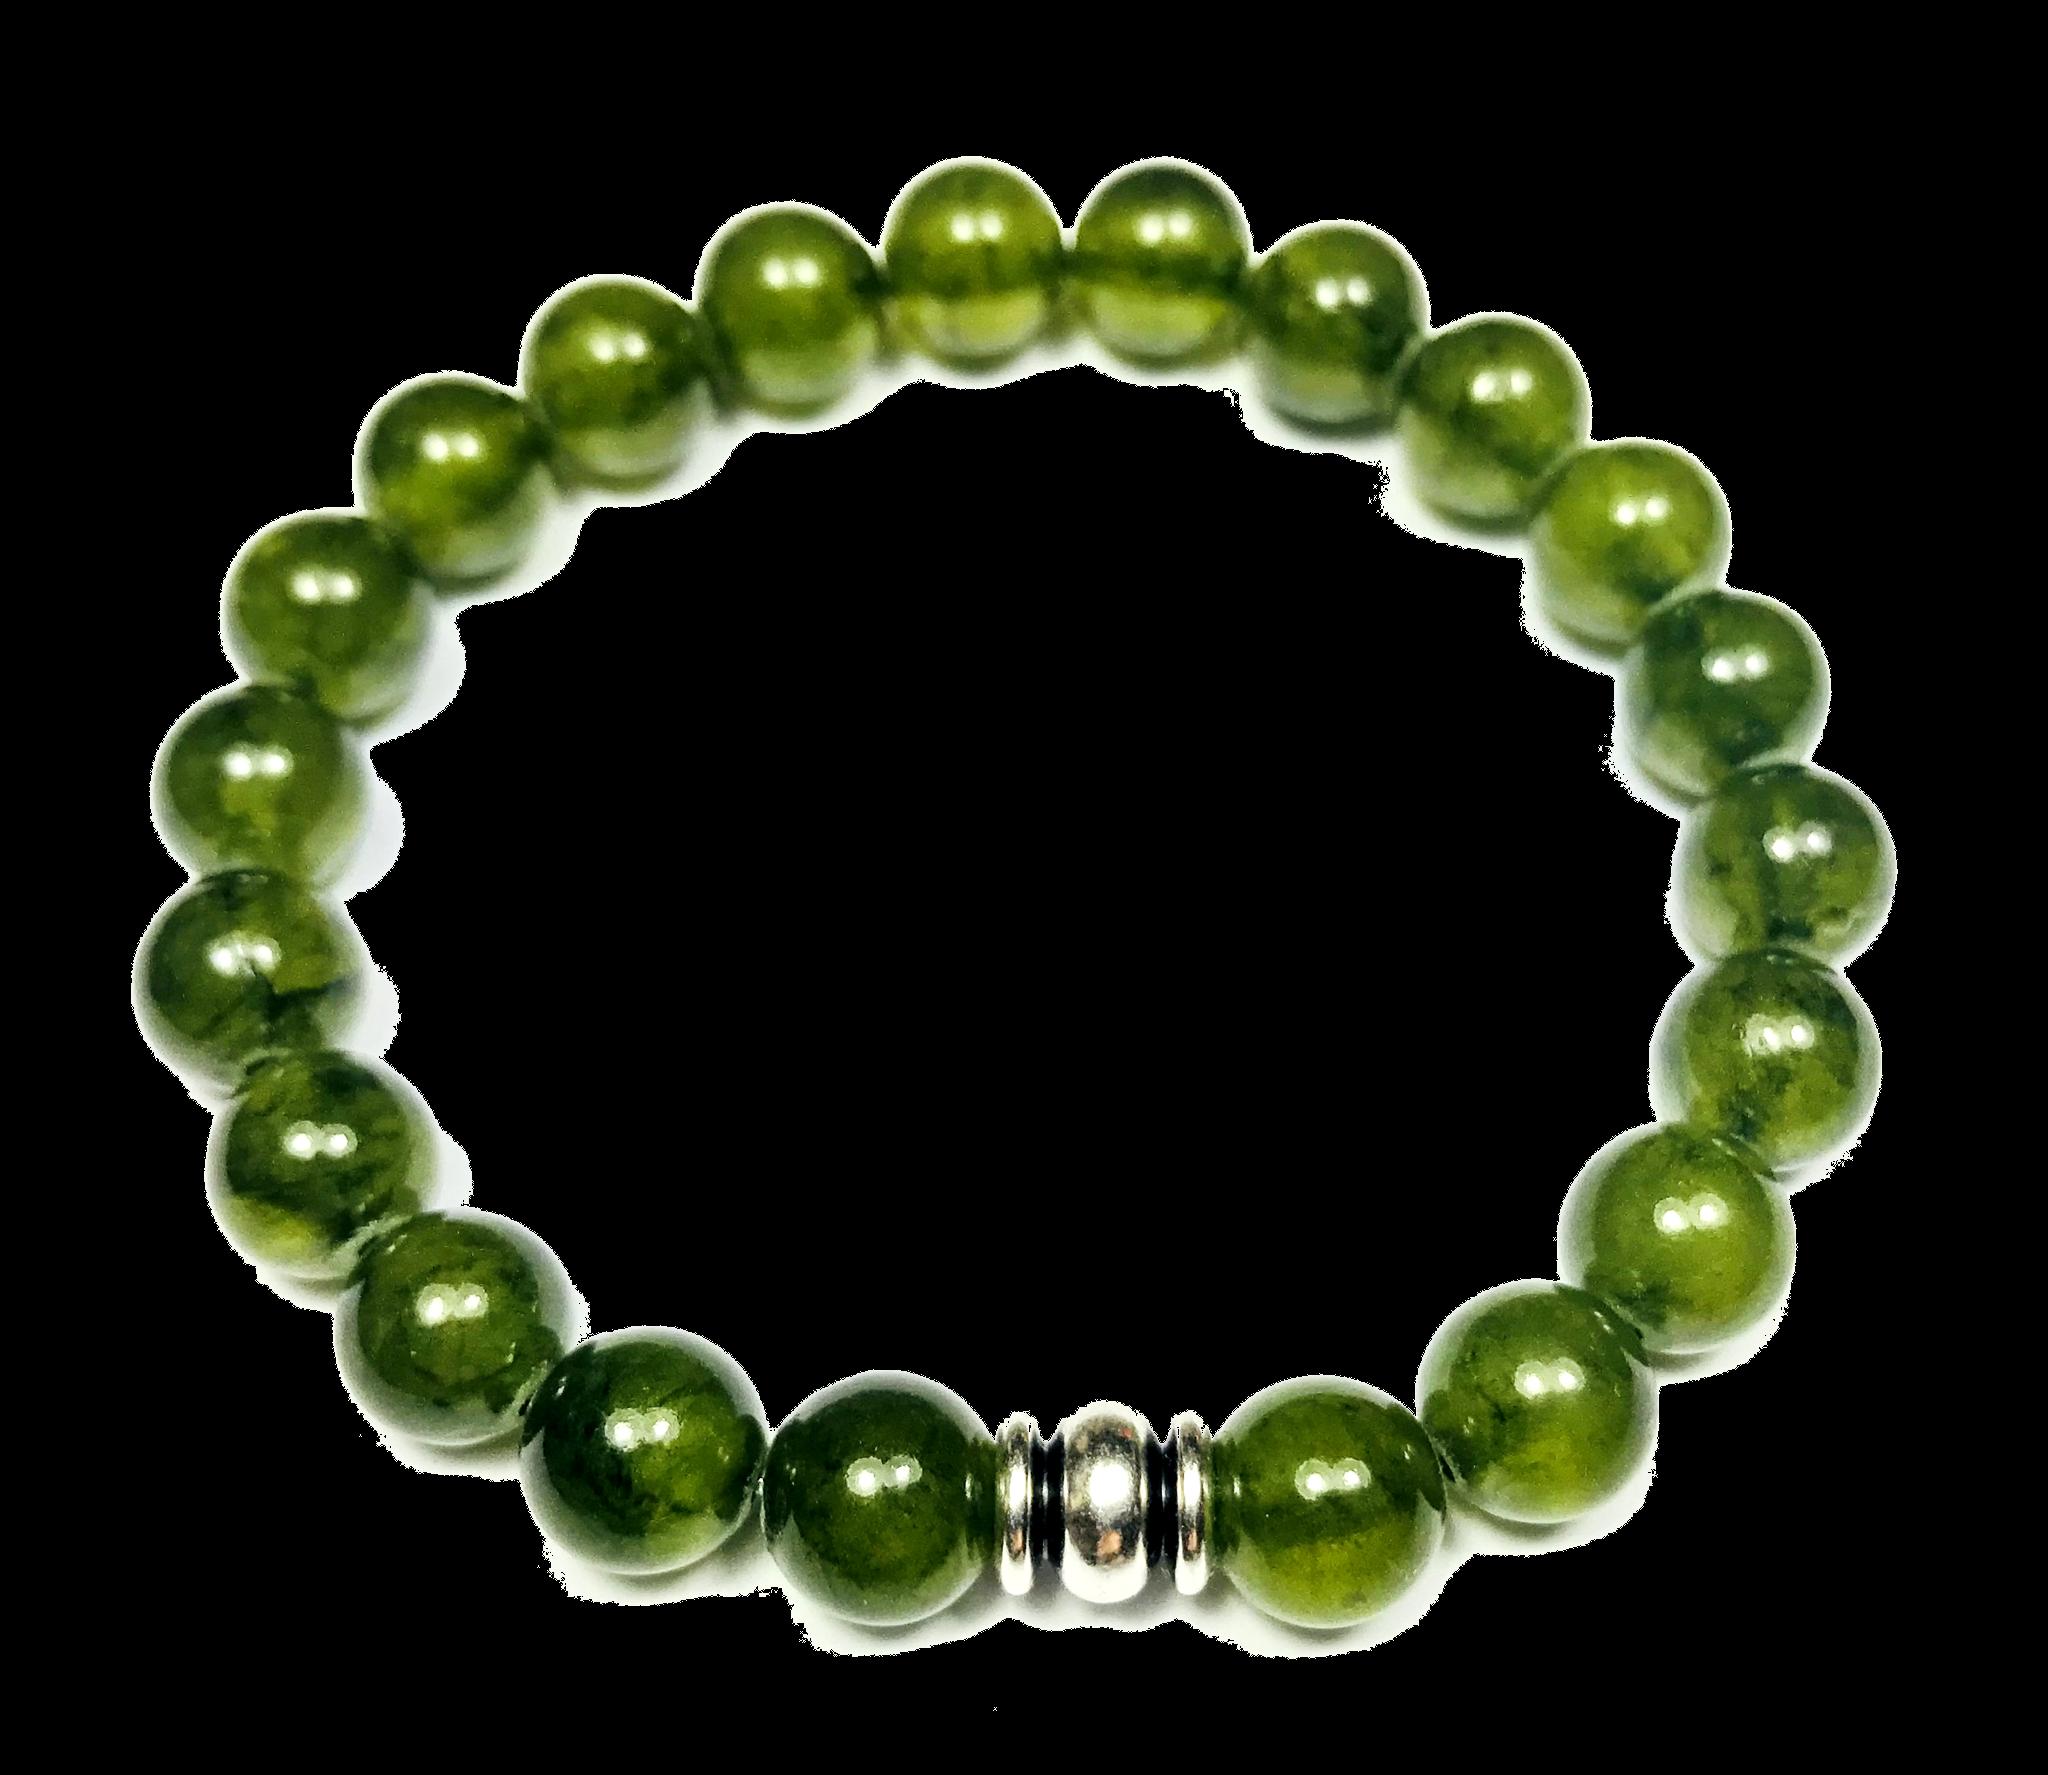 Wuhan - Bracelet en jade rainbow vert foncé pour homme Rainbow jade dark  green Bracelet for 5664b9fb2376